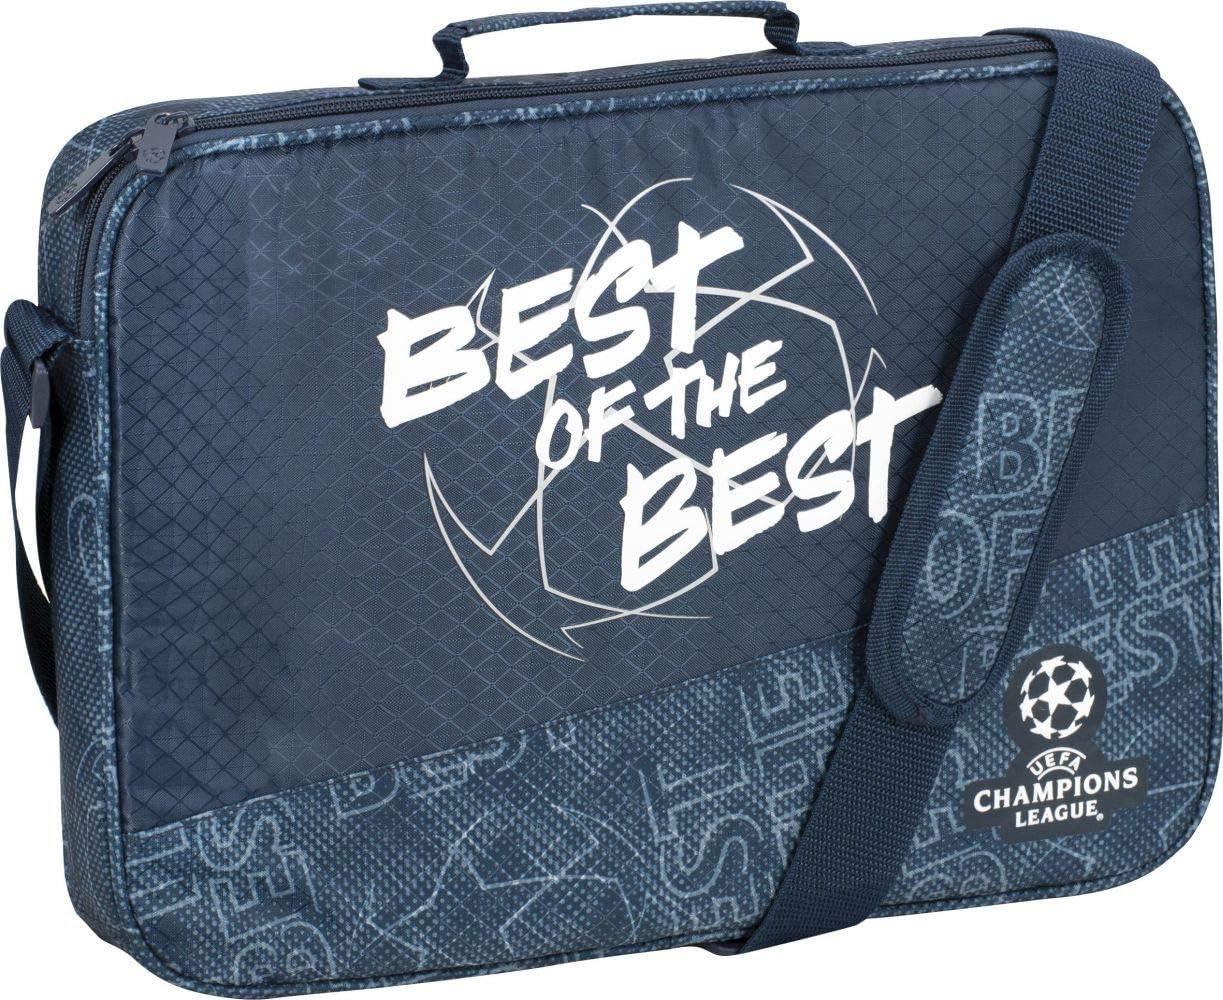 Cartera Extraescolar Champions League The Best: Amazon.es: Equipaje